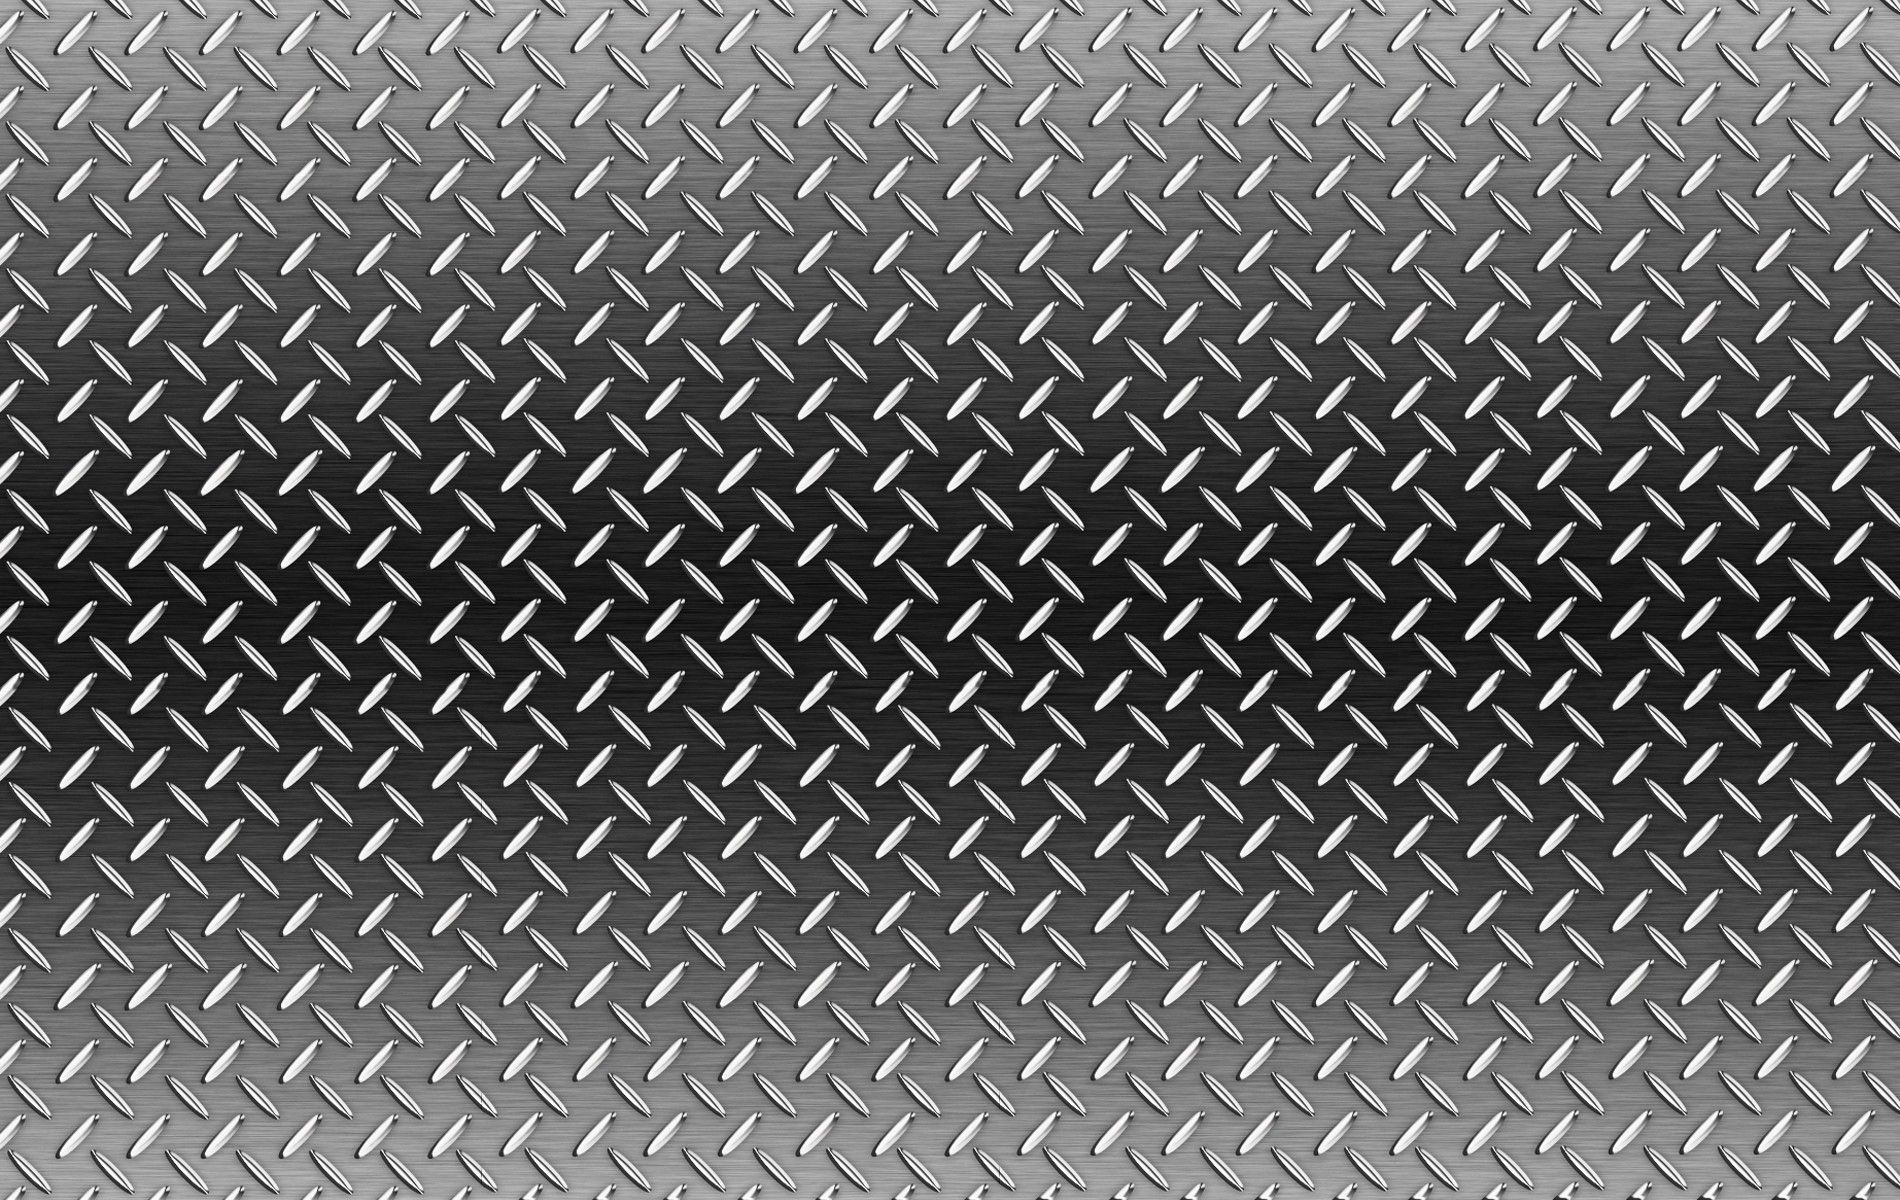 pin by sabriyyah khawaja on industrial patterns pinterest